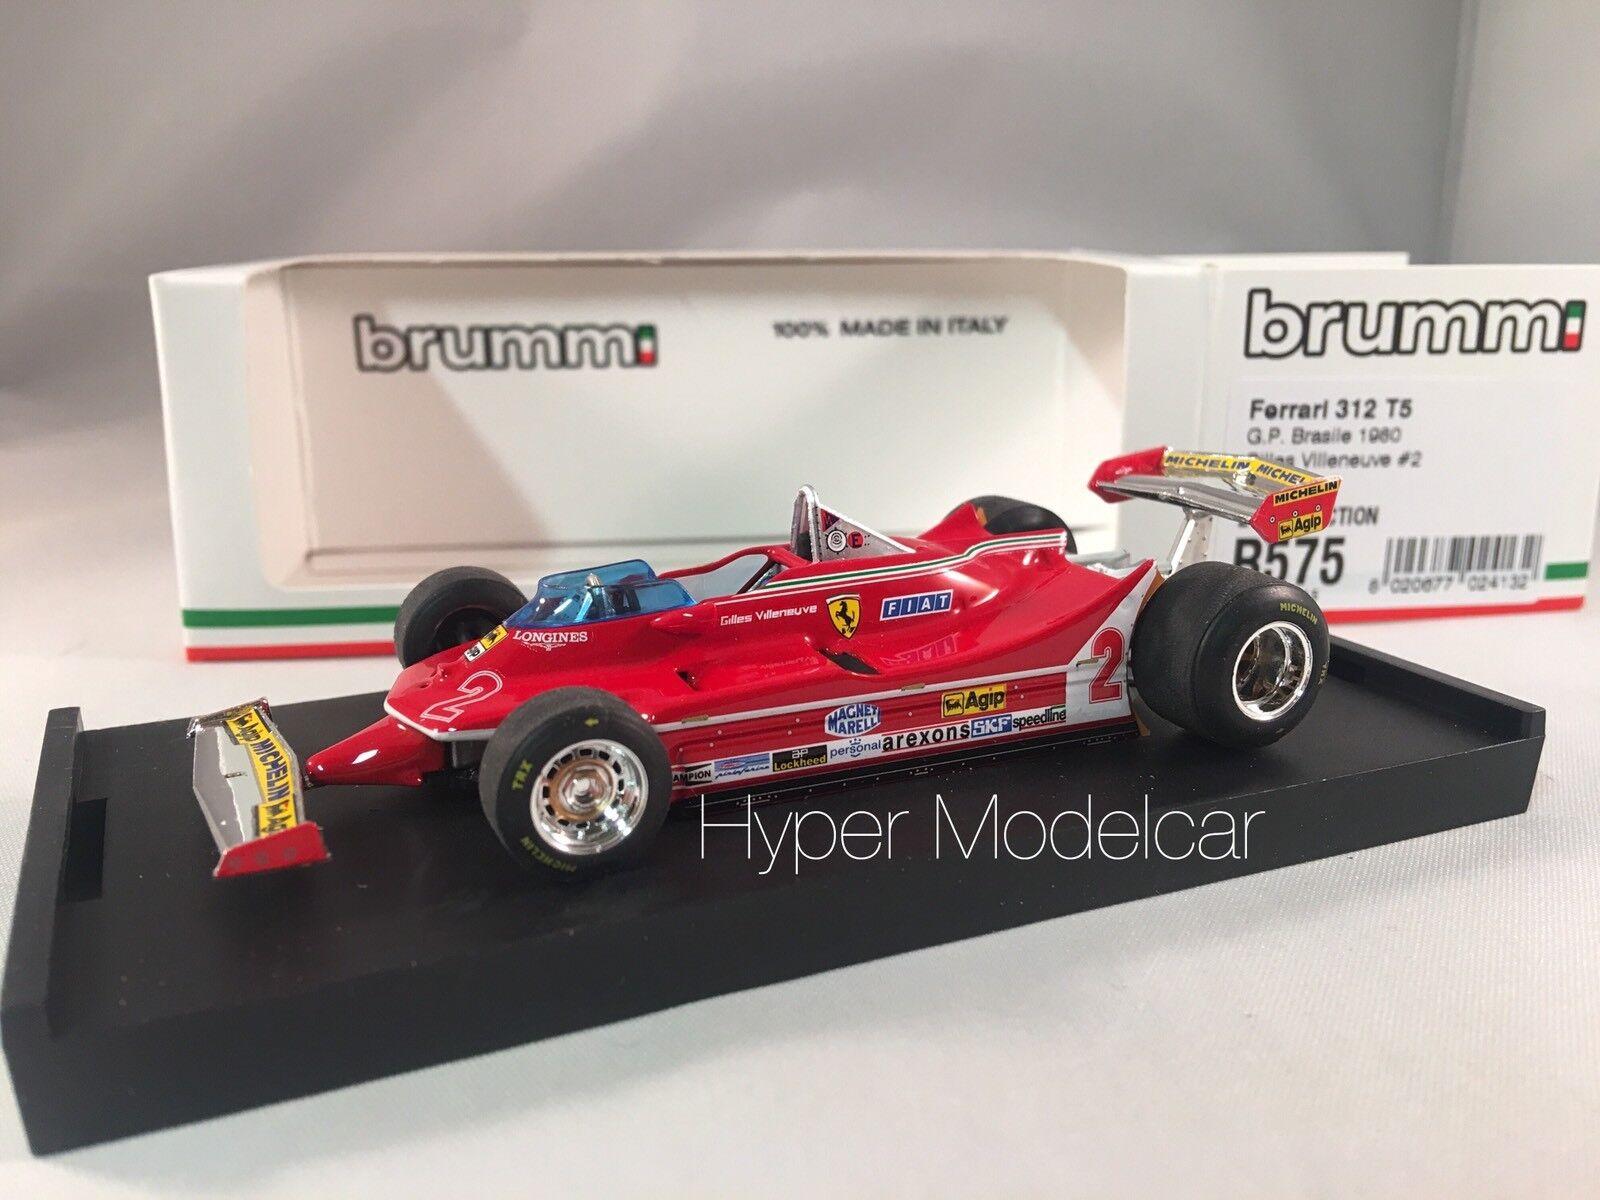 BRUMM 1 43 Ferrari 312 T5  2 Gp Brasile 1980  G. Villeneve Art. R575